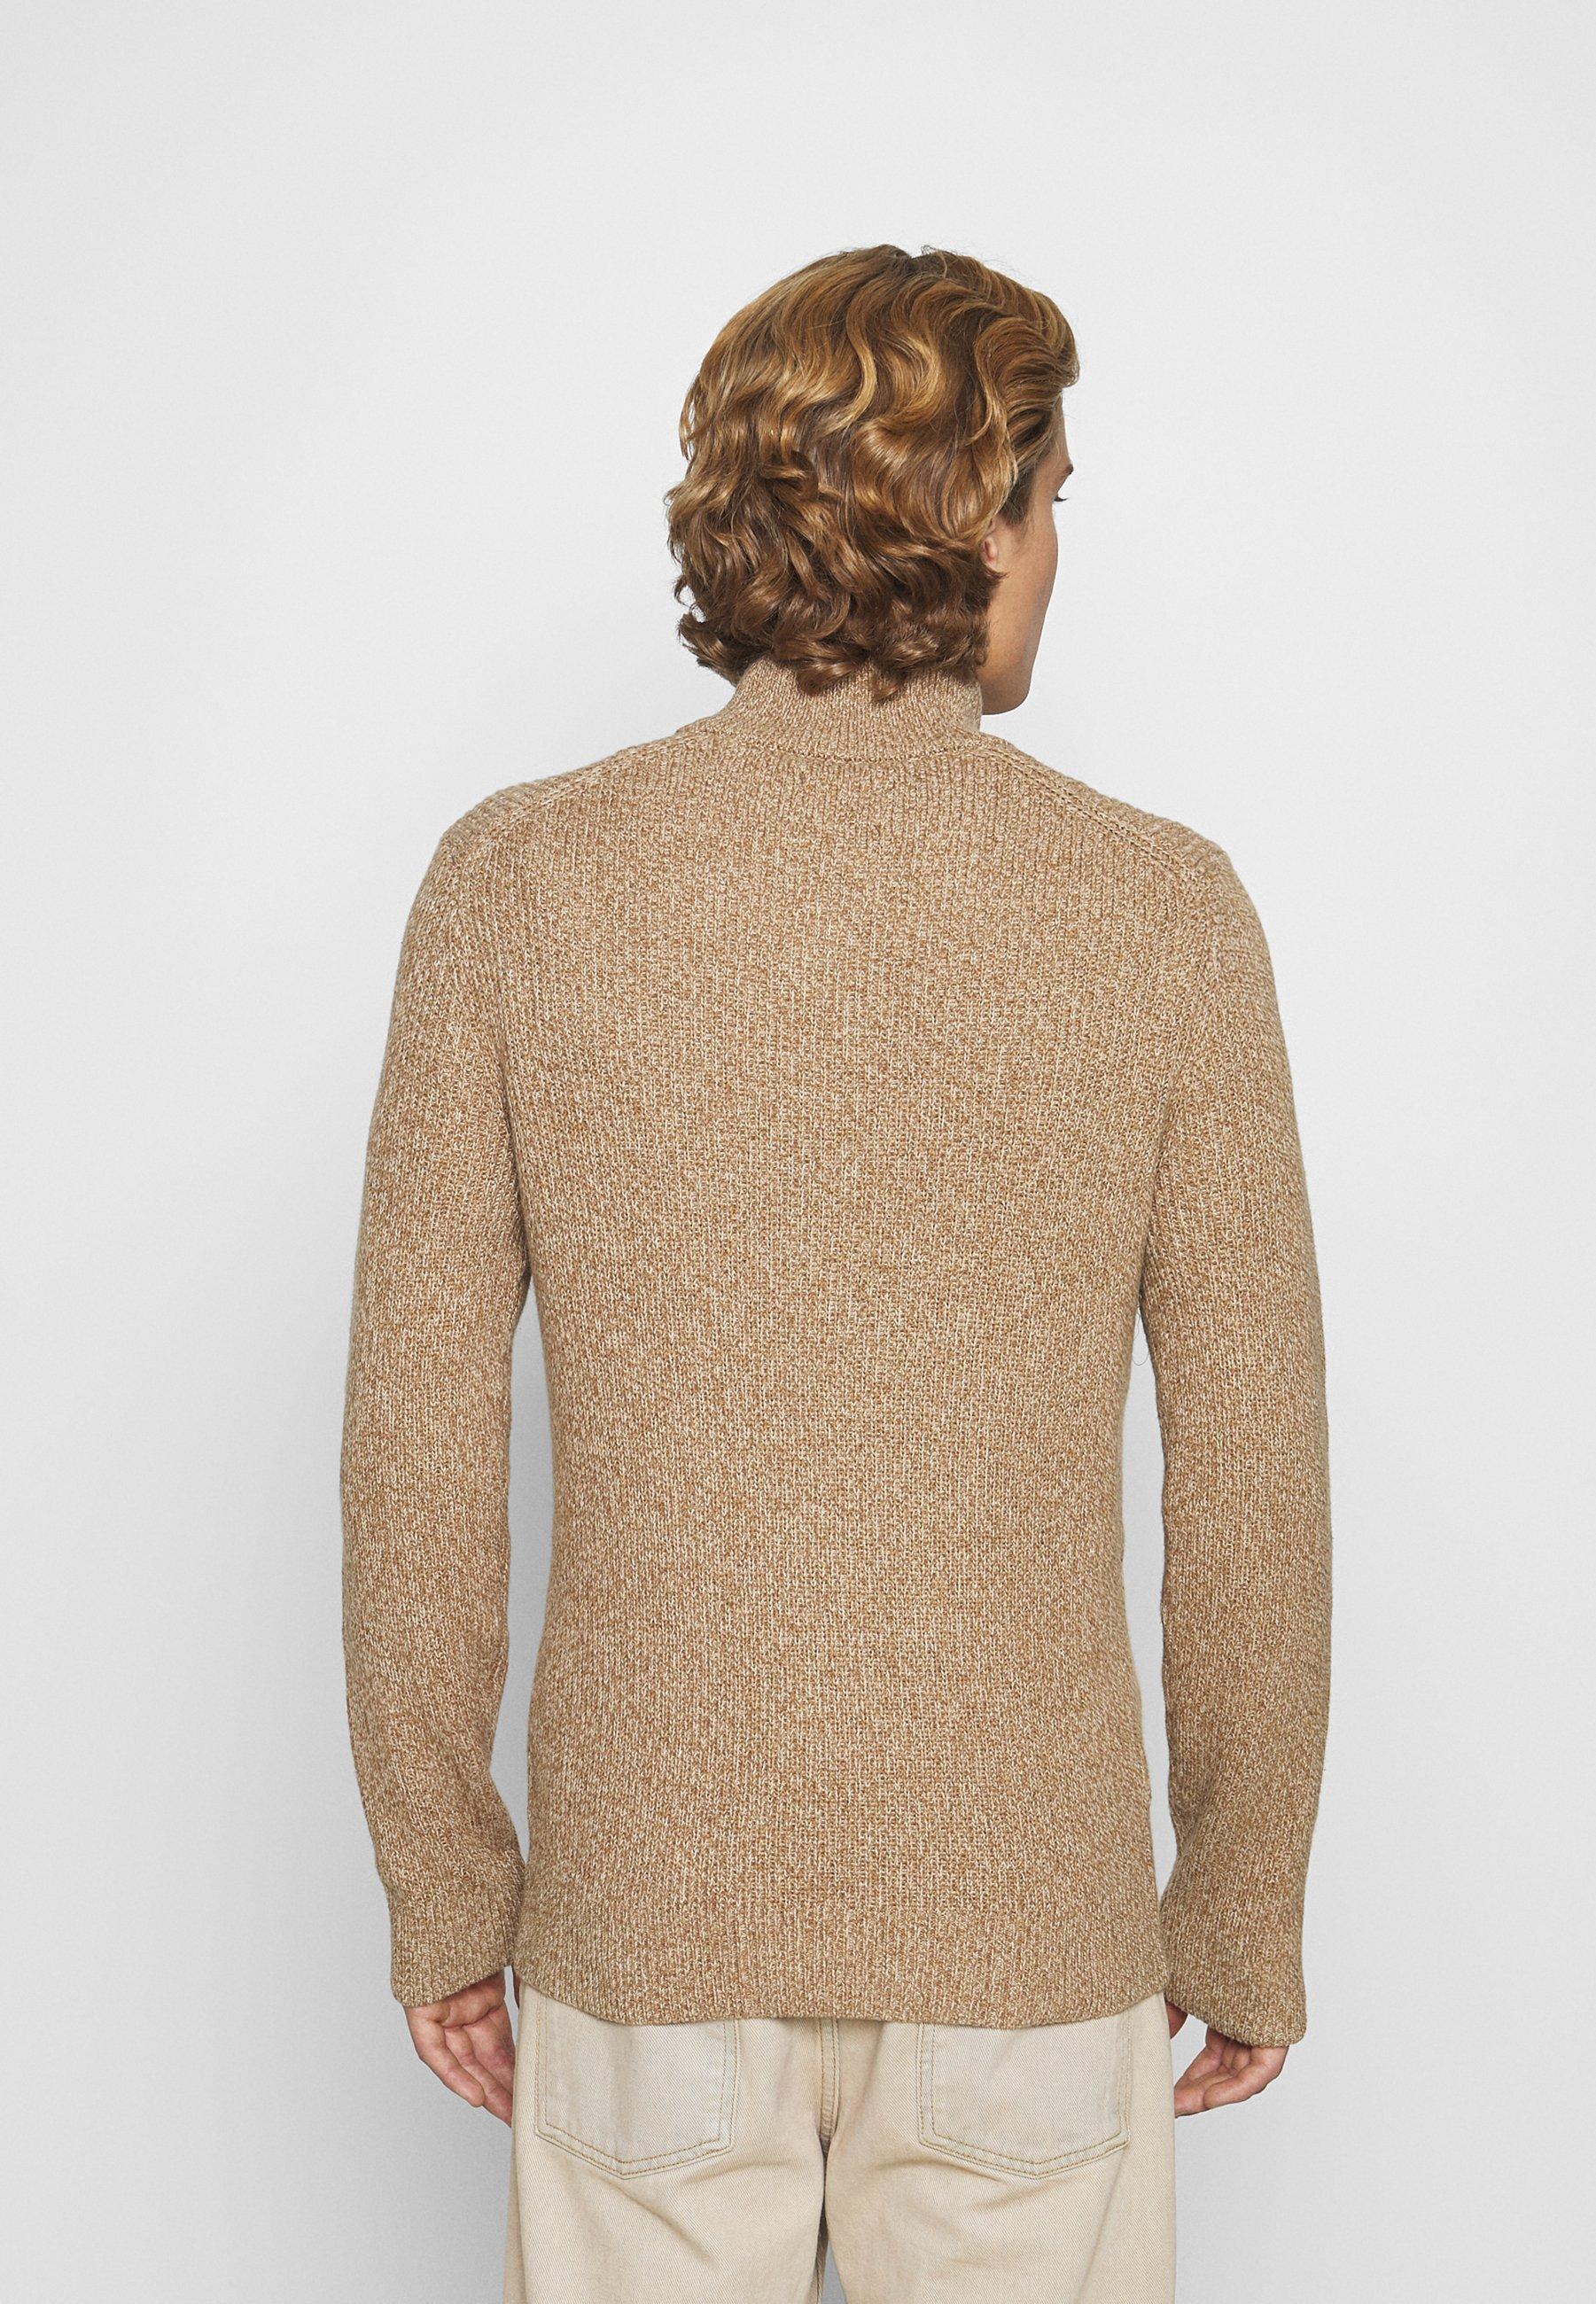 Abercrombie & Fitch Core Icon Zip - Strikkegenser Tan/beige